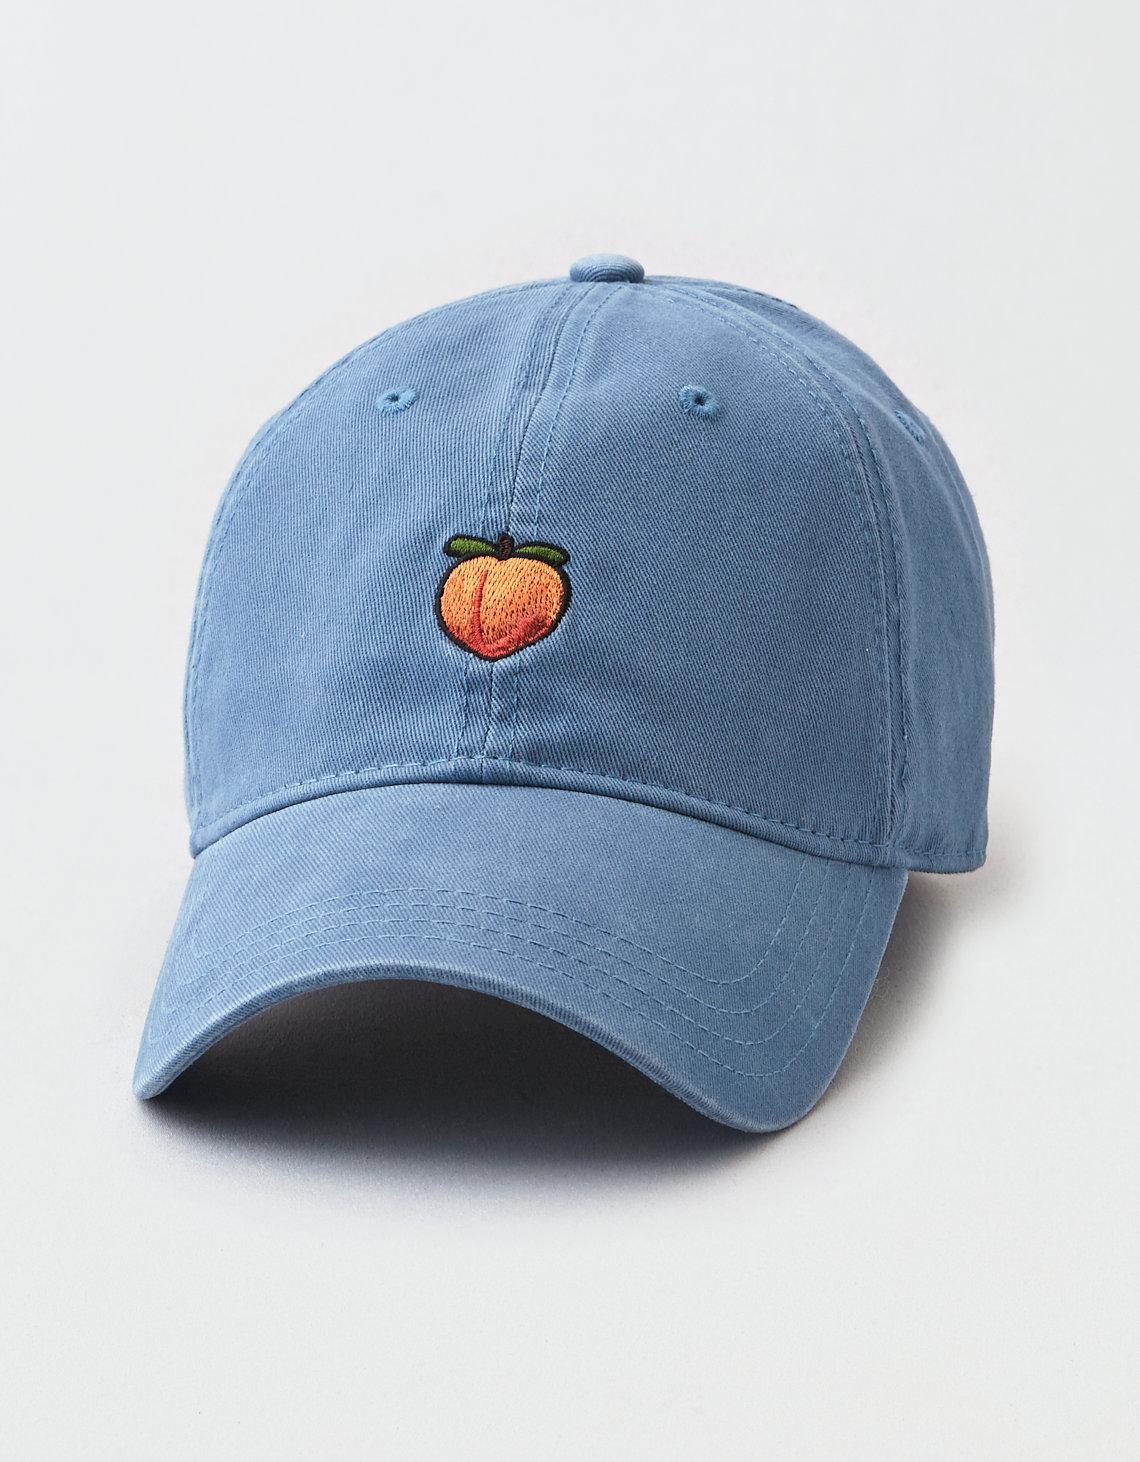 8460707c19e8c AEO Peach Baseball Cap. Placeholder image. Product Image